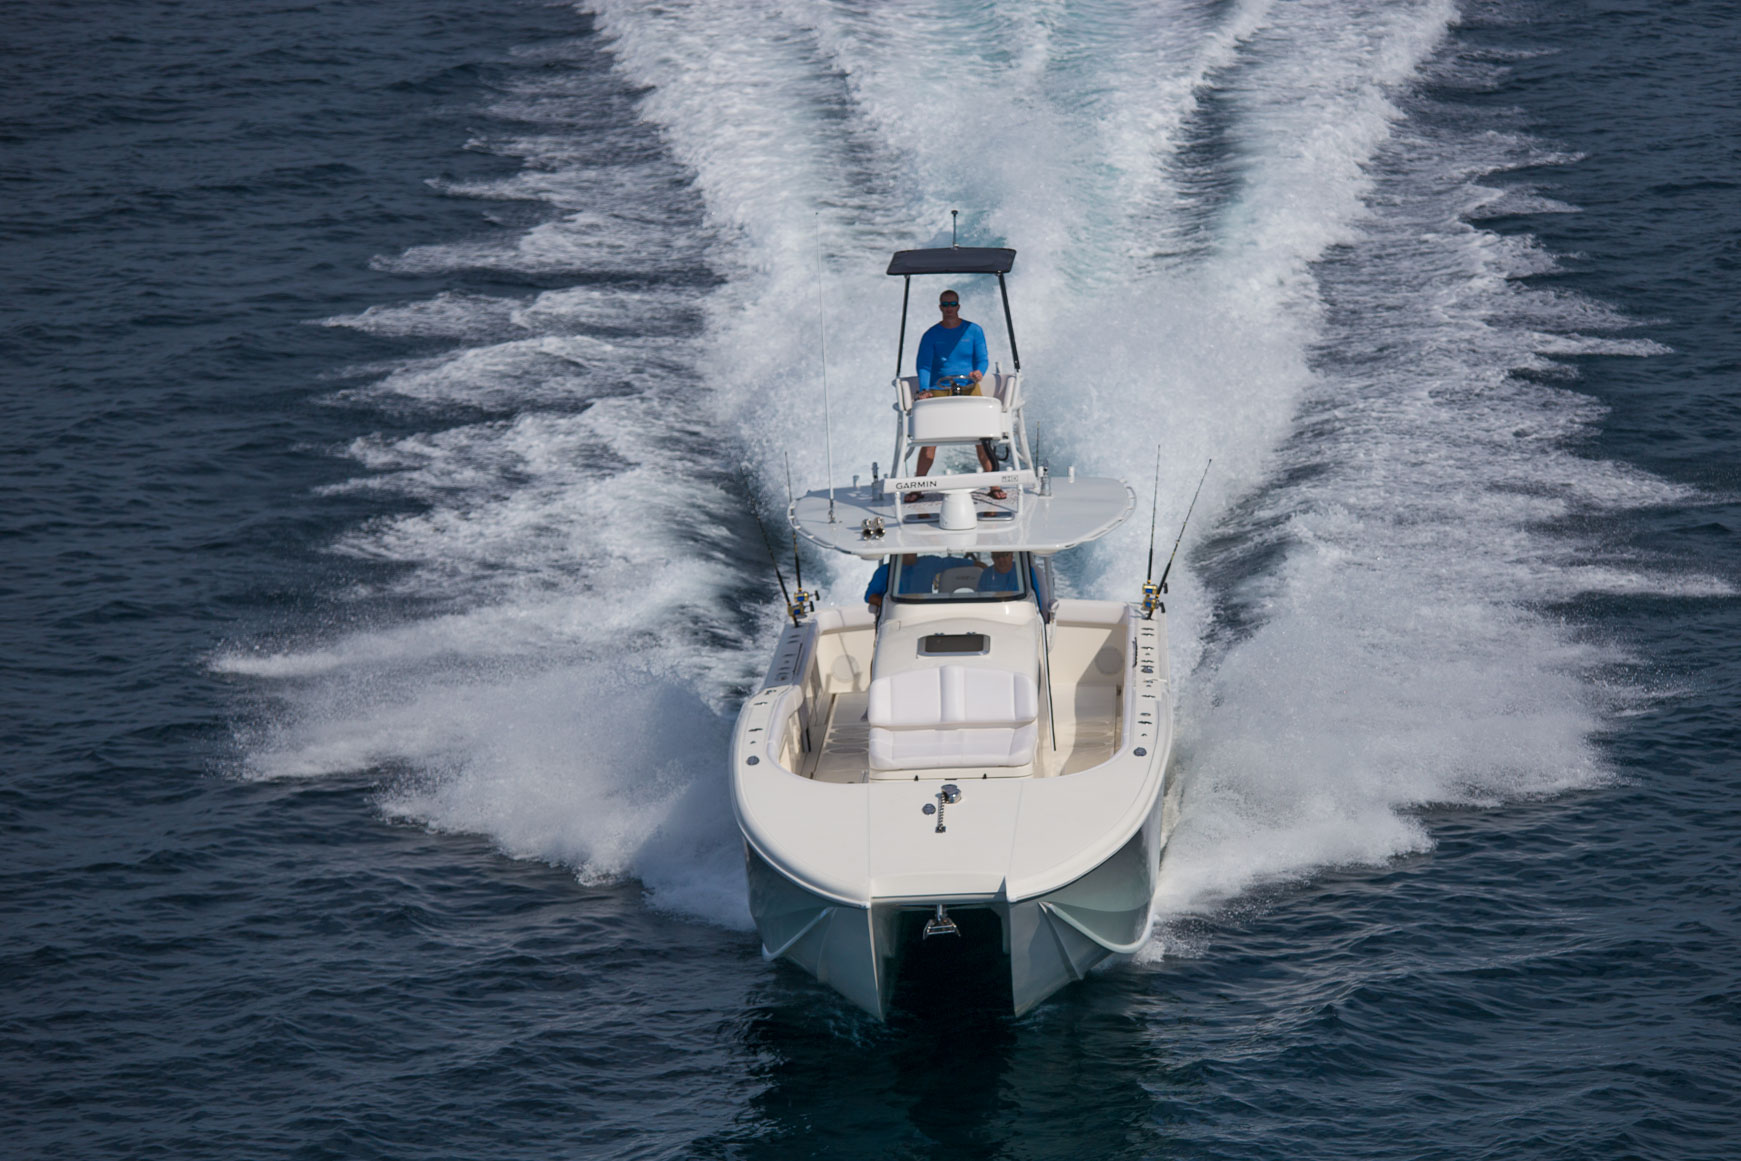 insetta-boat-driving-toward-viewer